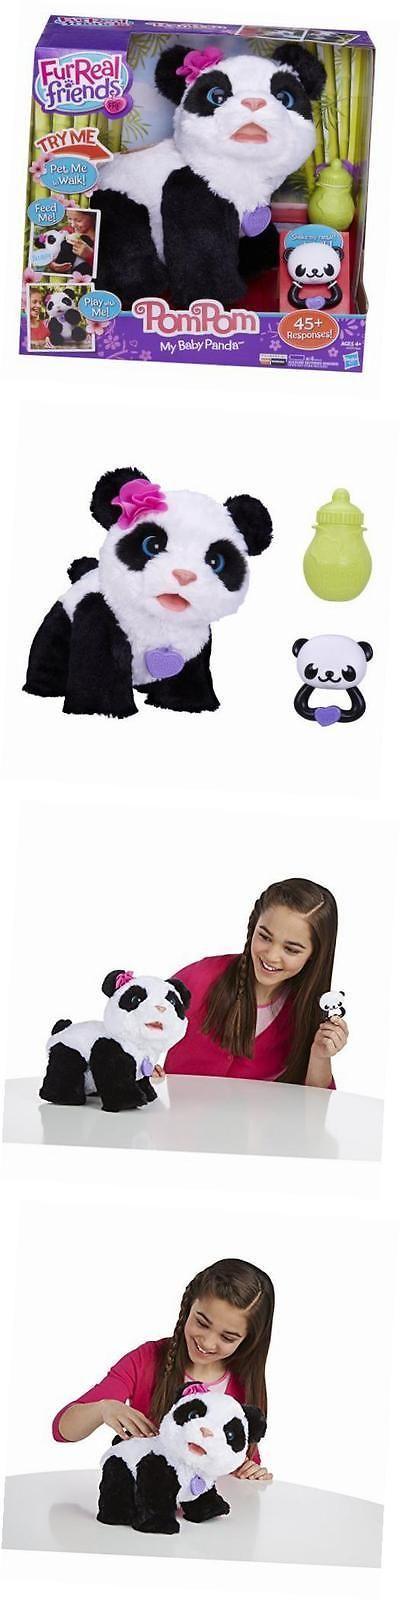 FurReal Friends 38288: Furreal Friends Pom Pom My Baby Panda Pet -> BUY IT NOW ONLY: $73.32 on eBay!